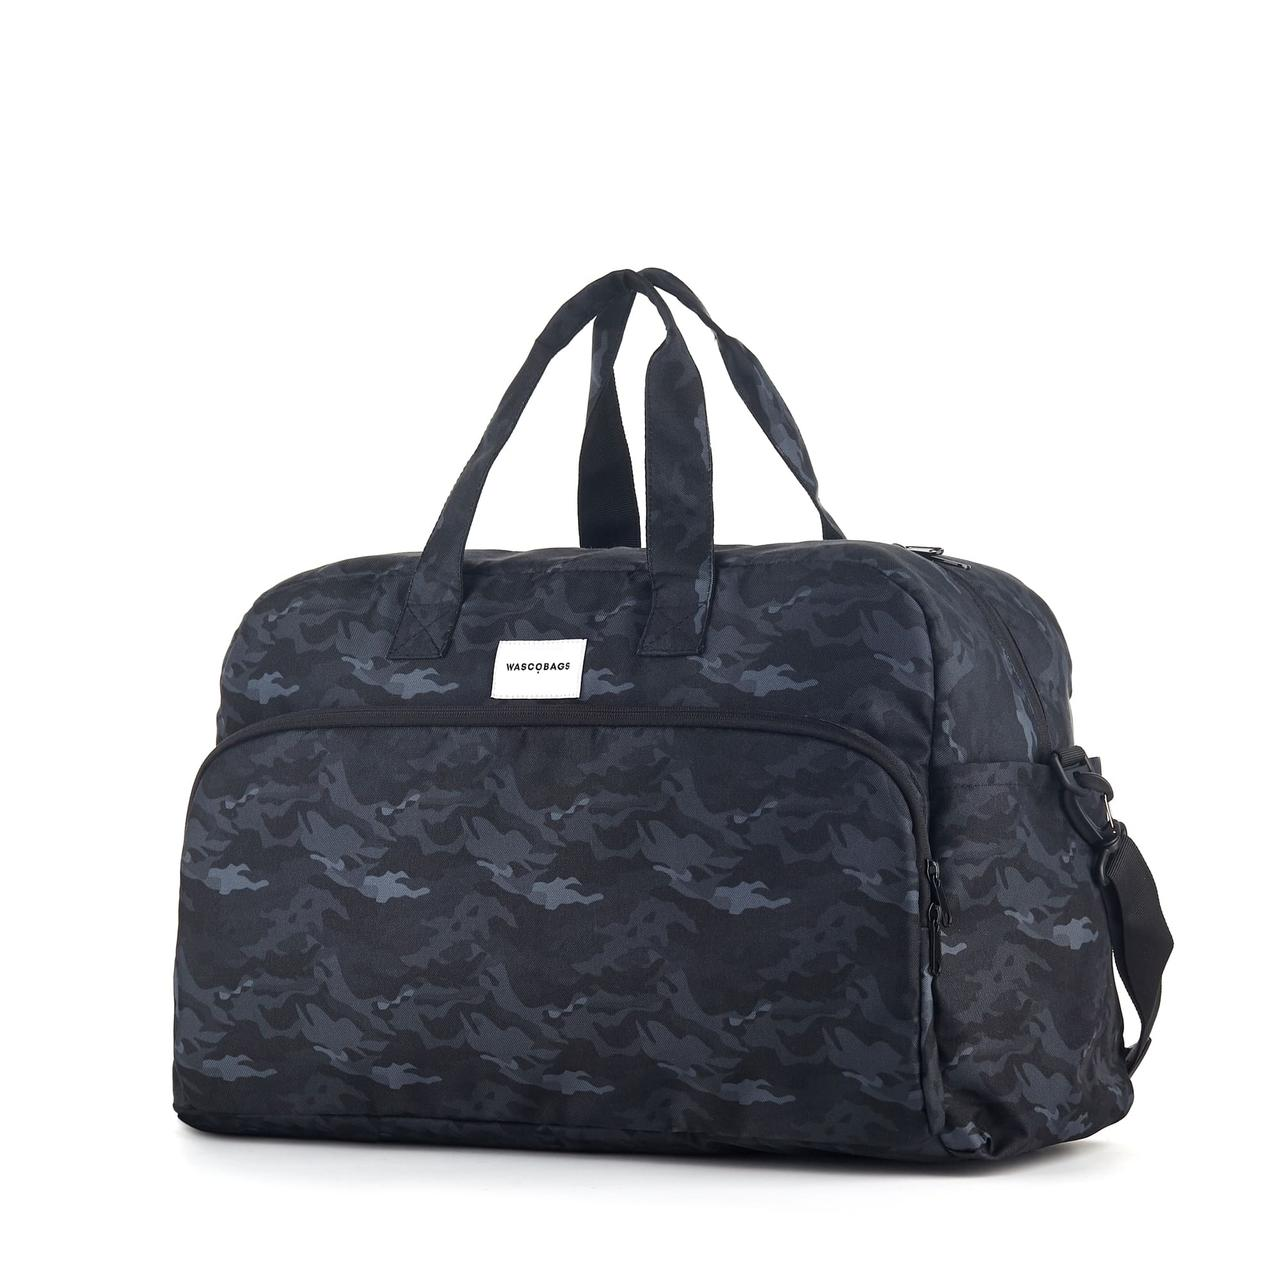 Дорожная сумка Wascobags Milano Camo (33 L)